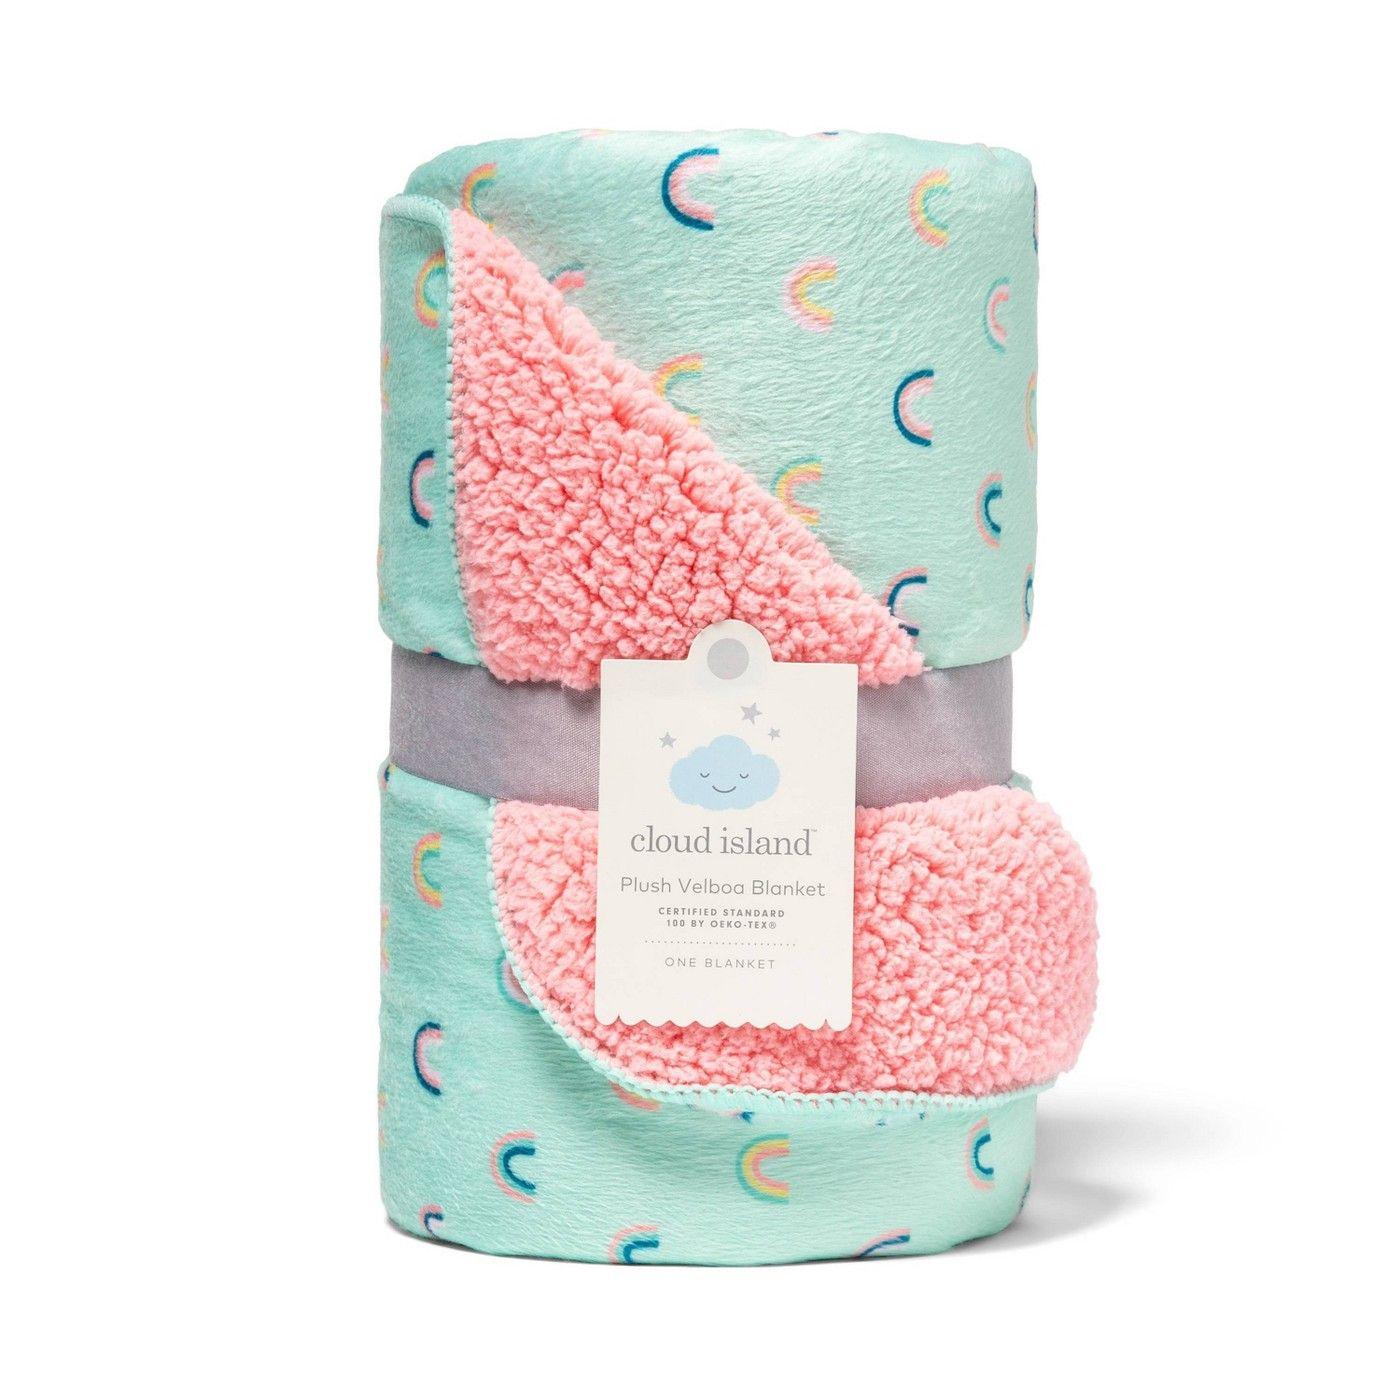 Plush Velboa Baby Blanket Rainbows Cloud Island Affiliate Baby Ad Velboa Plush Baby Blanket Rainbow Plush Baby Sensitive Skin